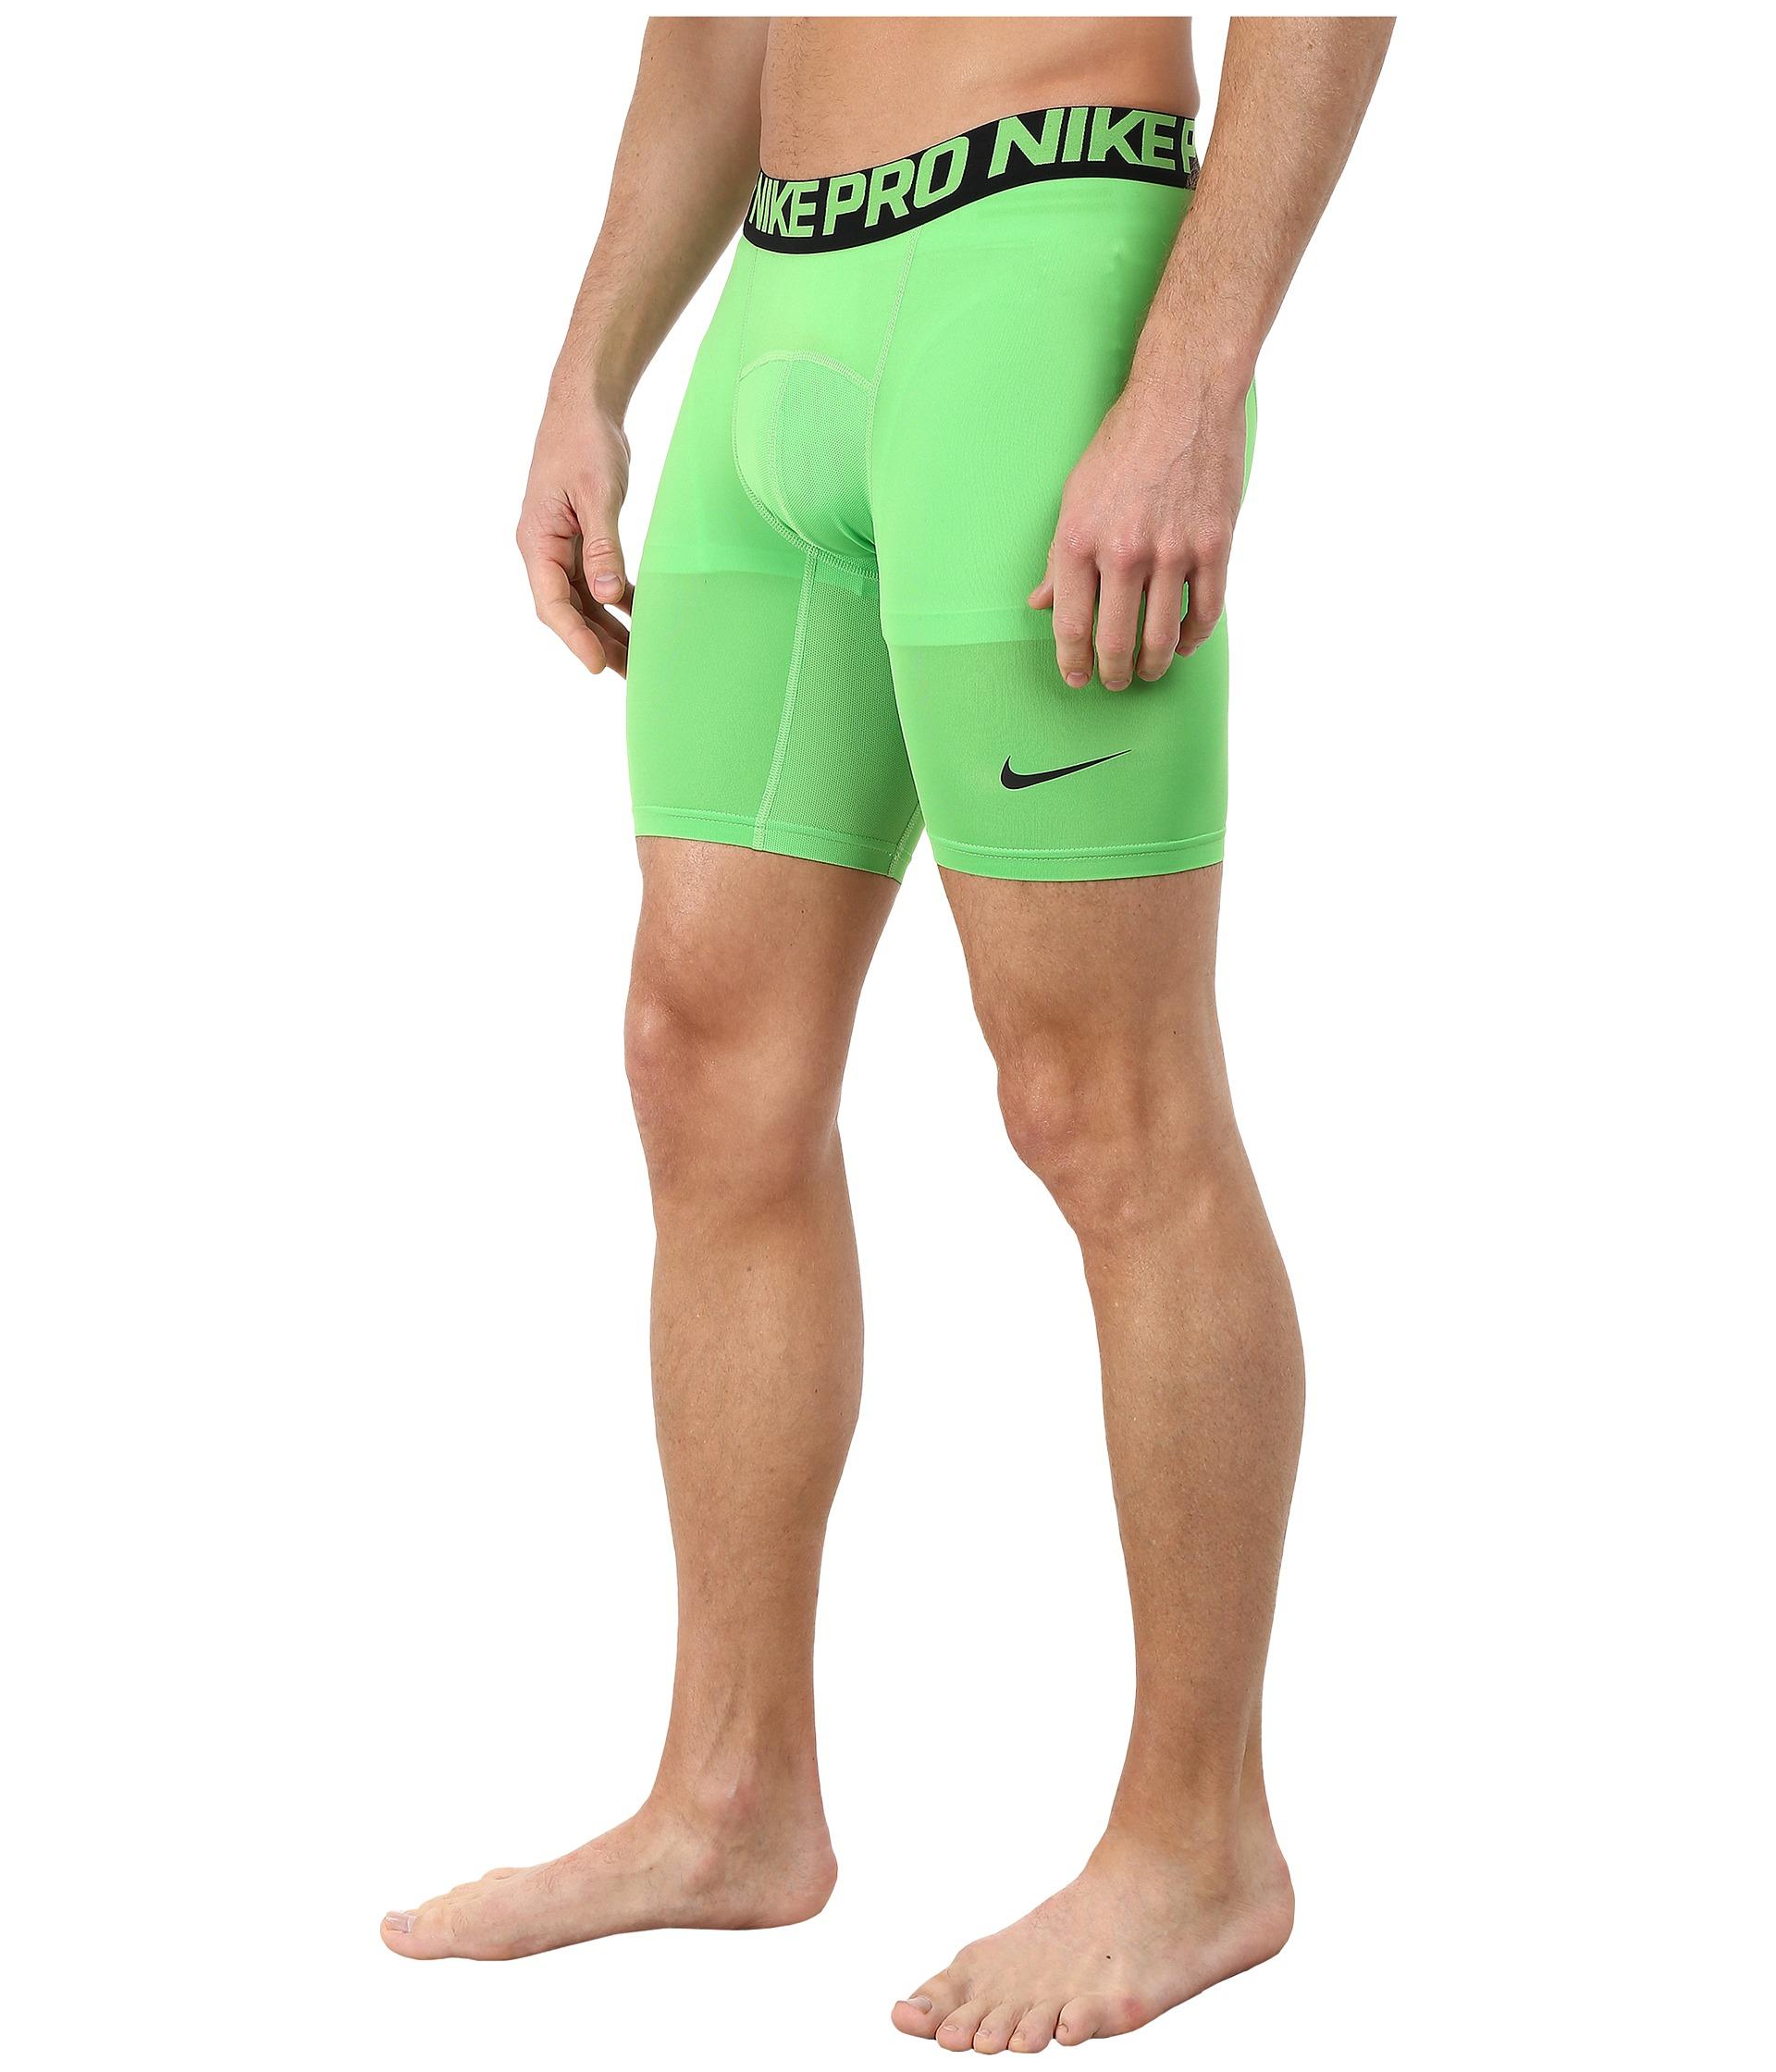 nike 6 compression shorts